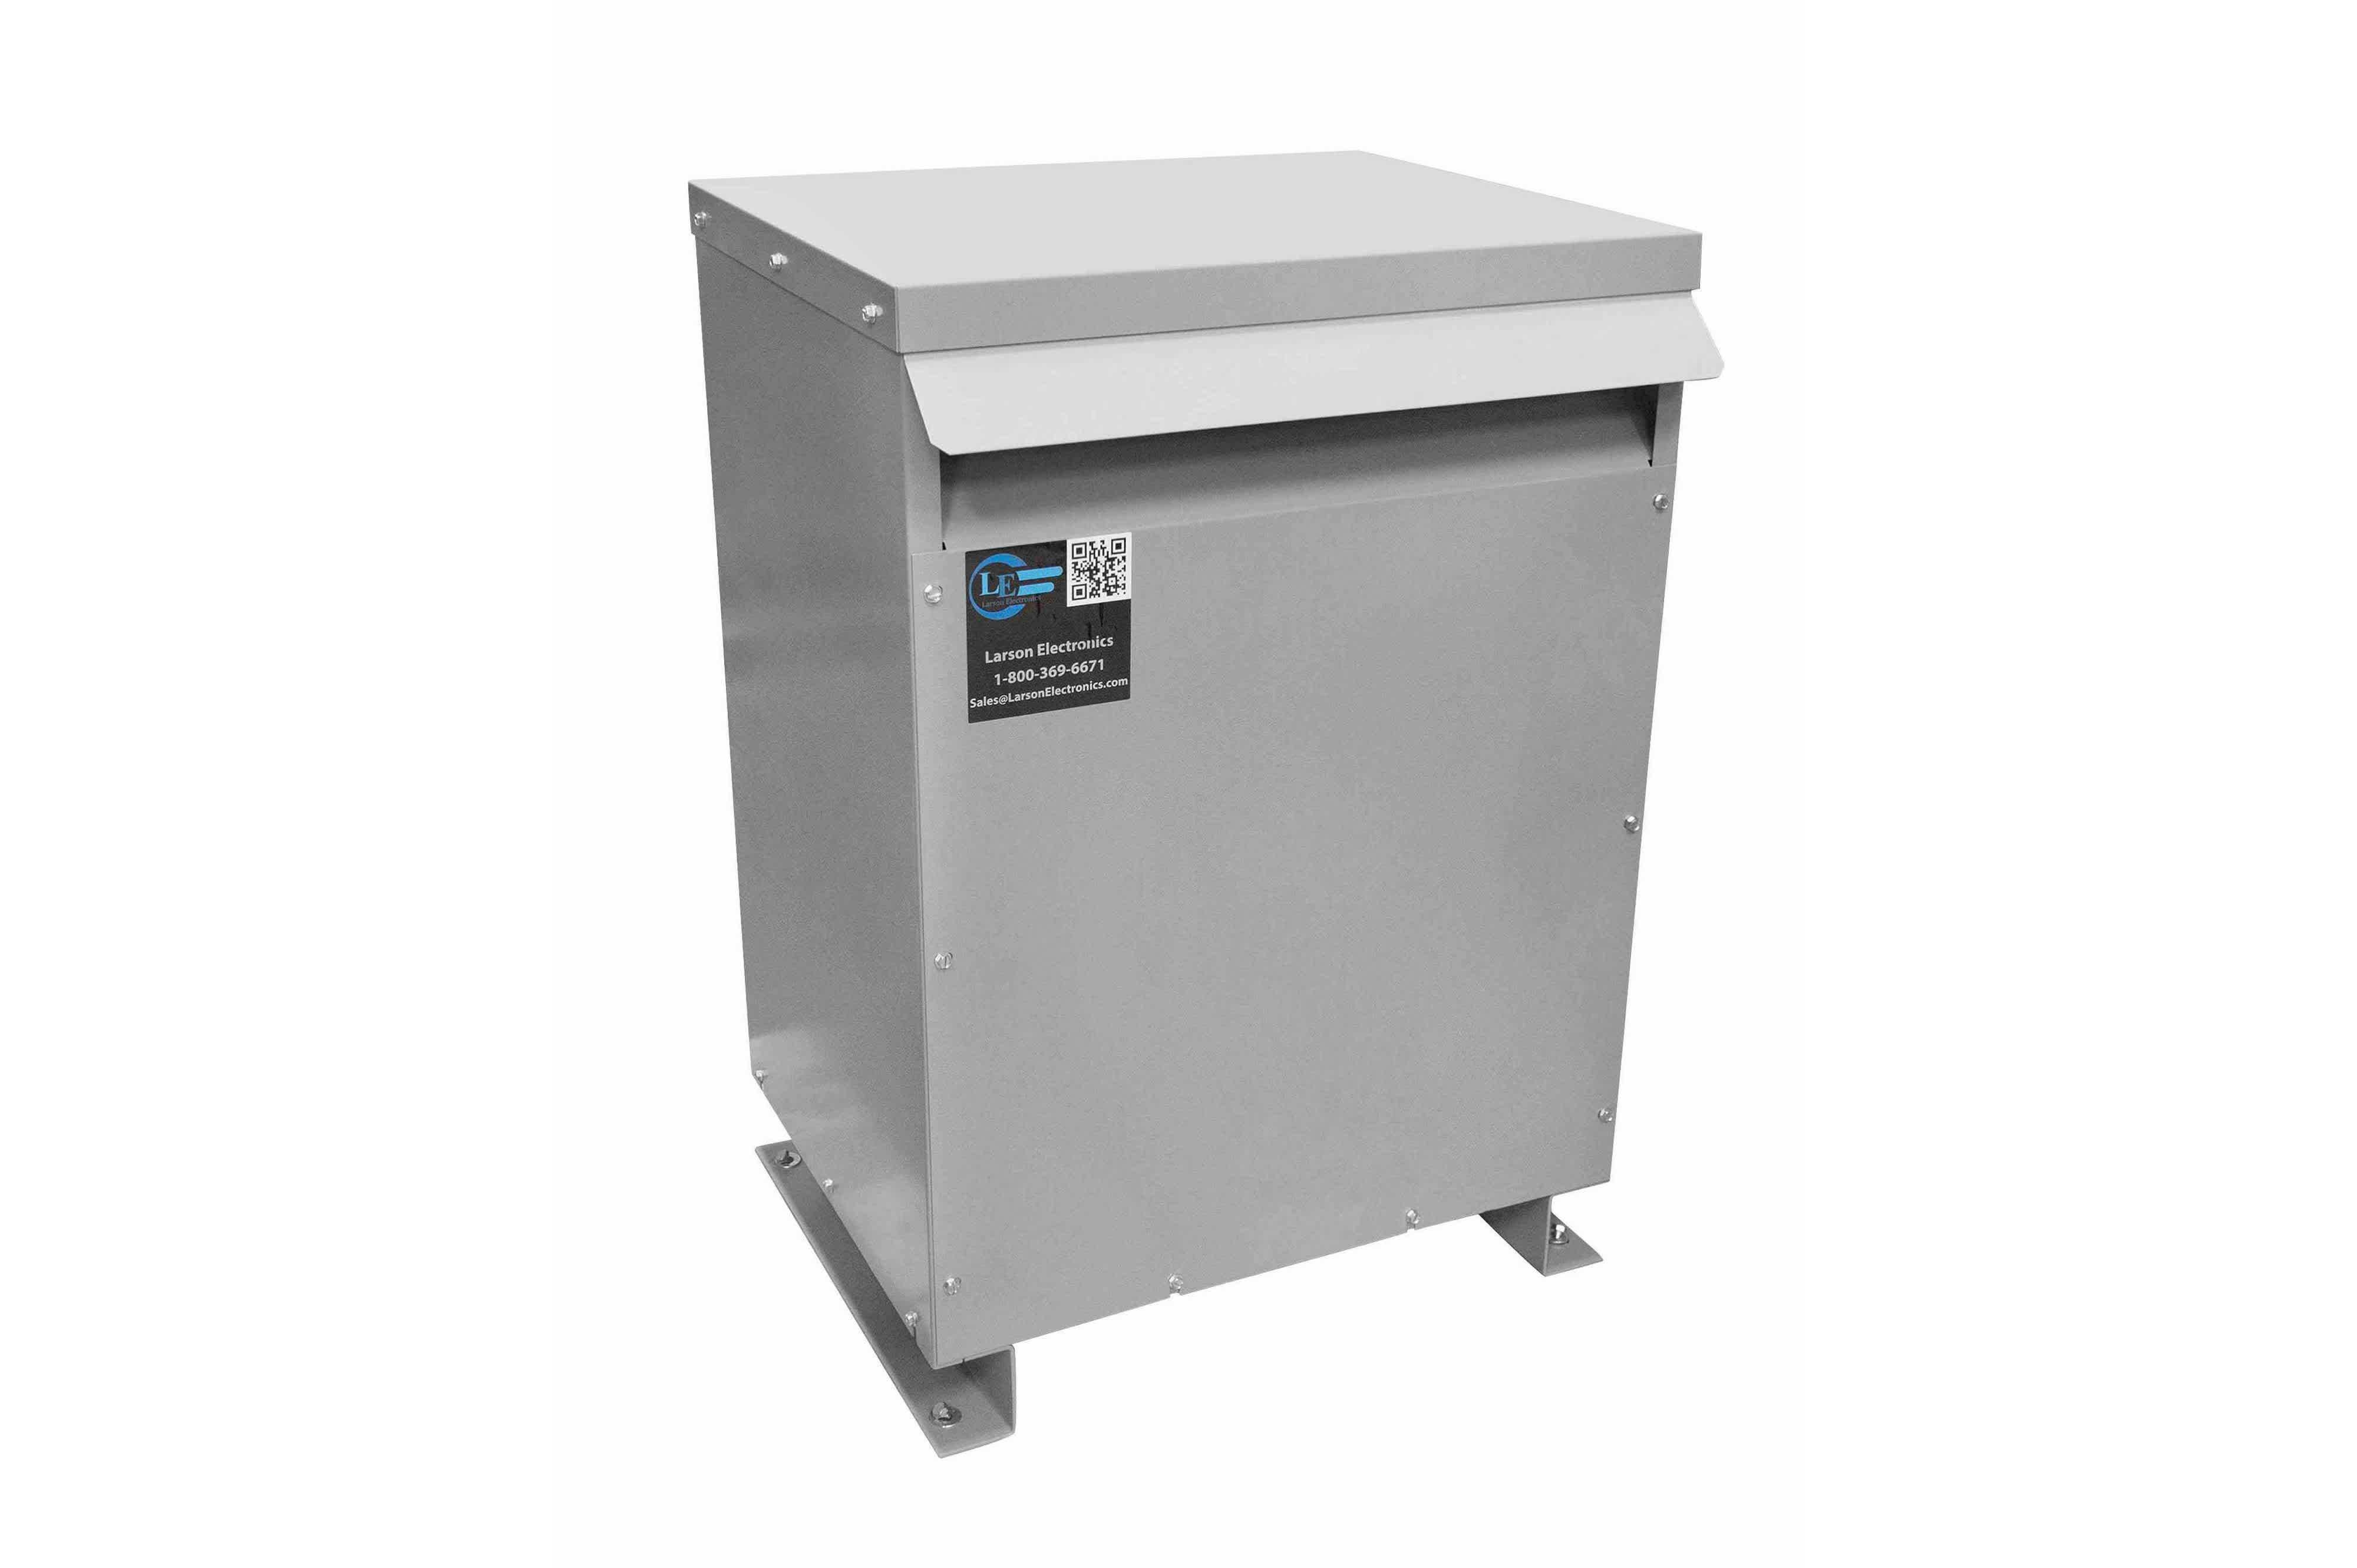 28 kVA 3PH Isolation Transformer, 480V Wye Primary, 575V Delta Secondary, N3R, Ventilated, 60 Hz